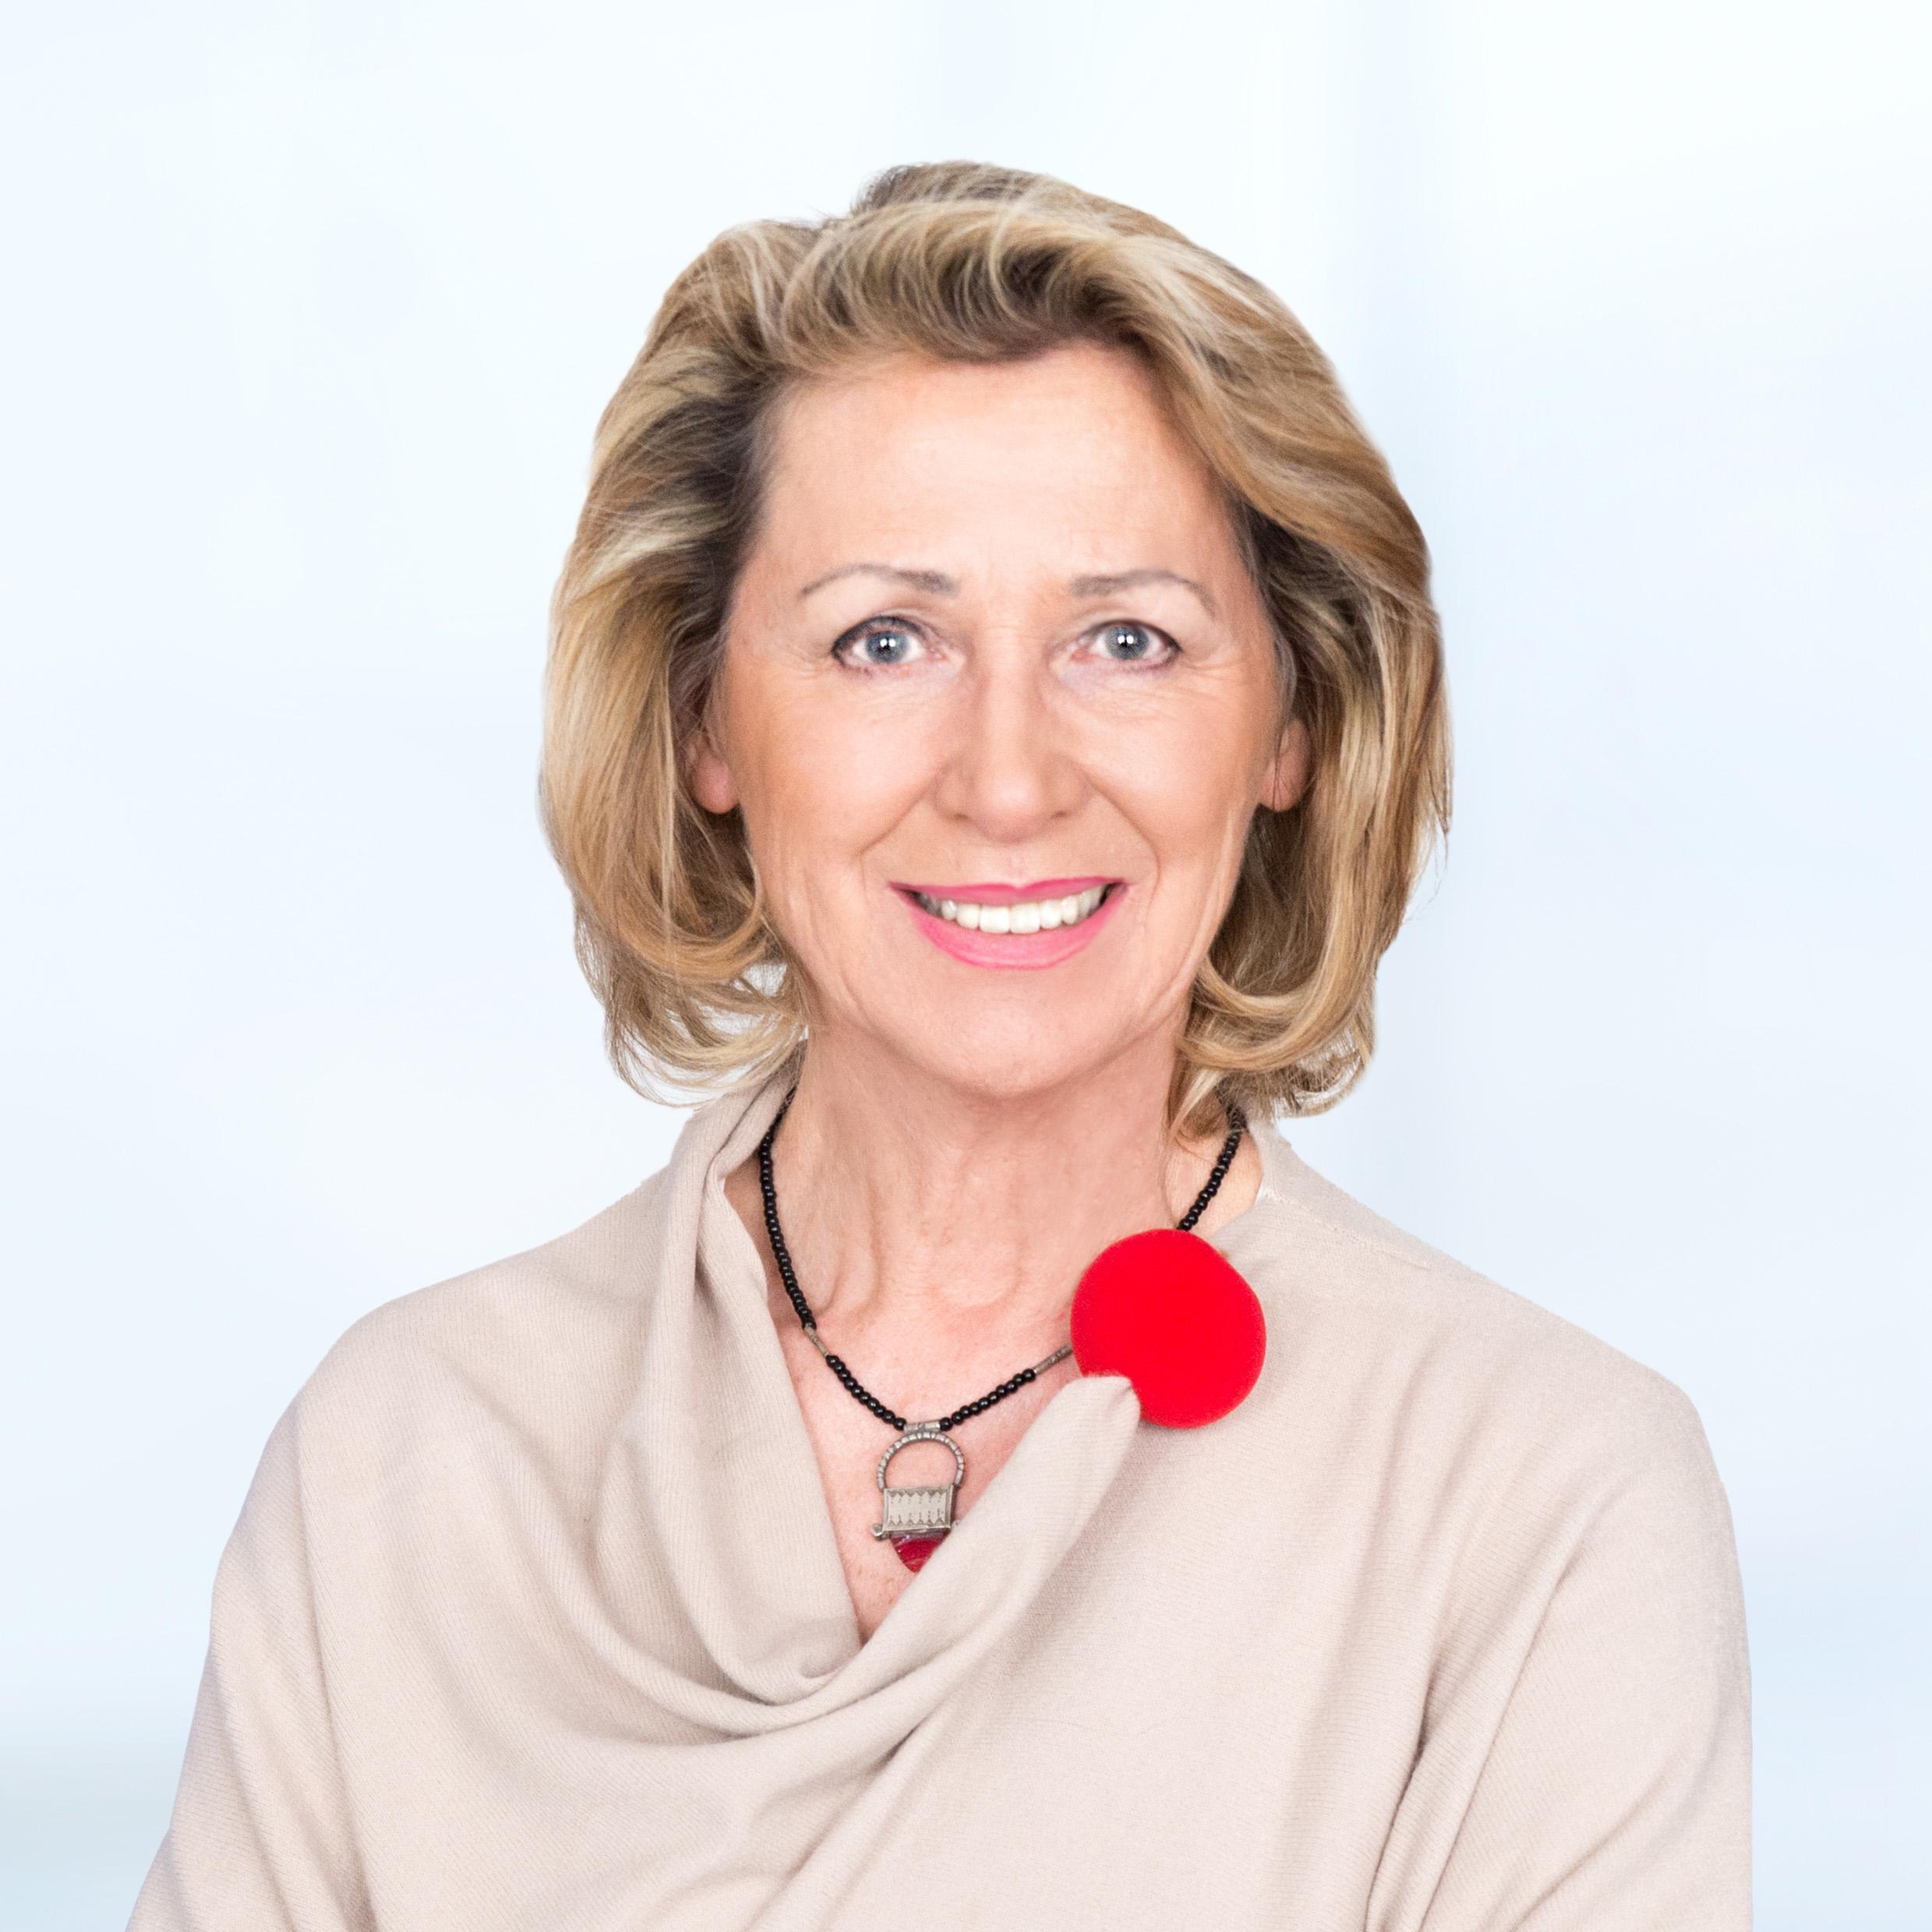 Special talk at Traditional Medicine Virtual 2020 - Monica Culen